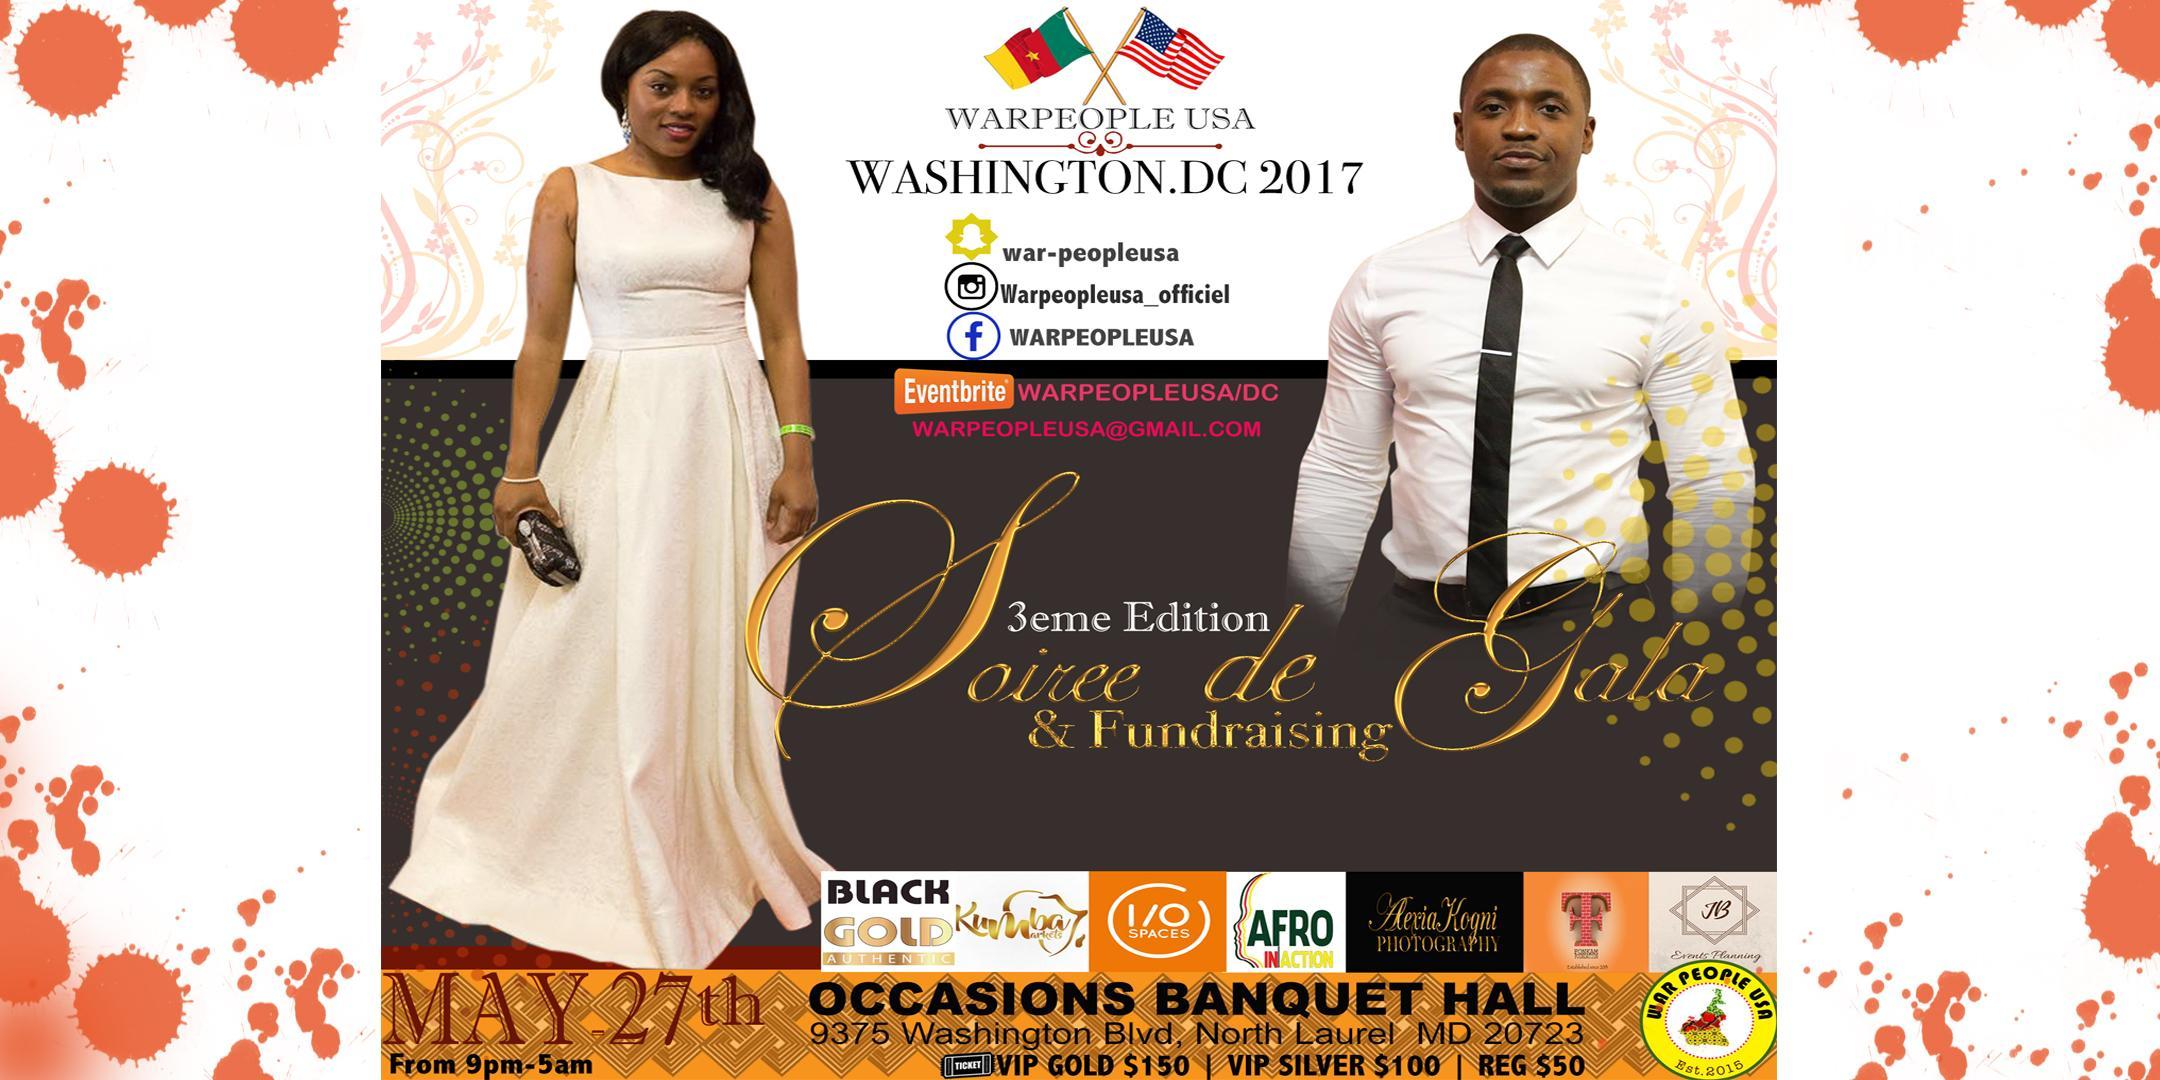 WASHINGTON,DC 2017